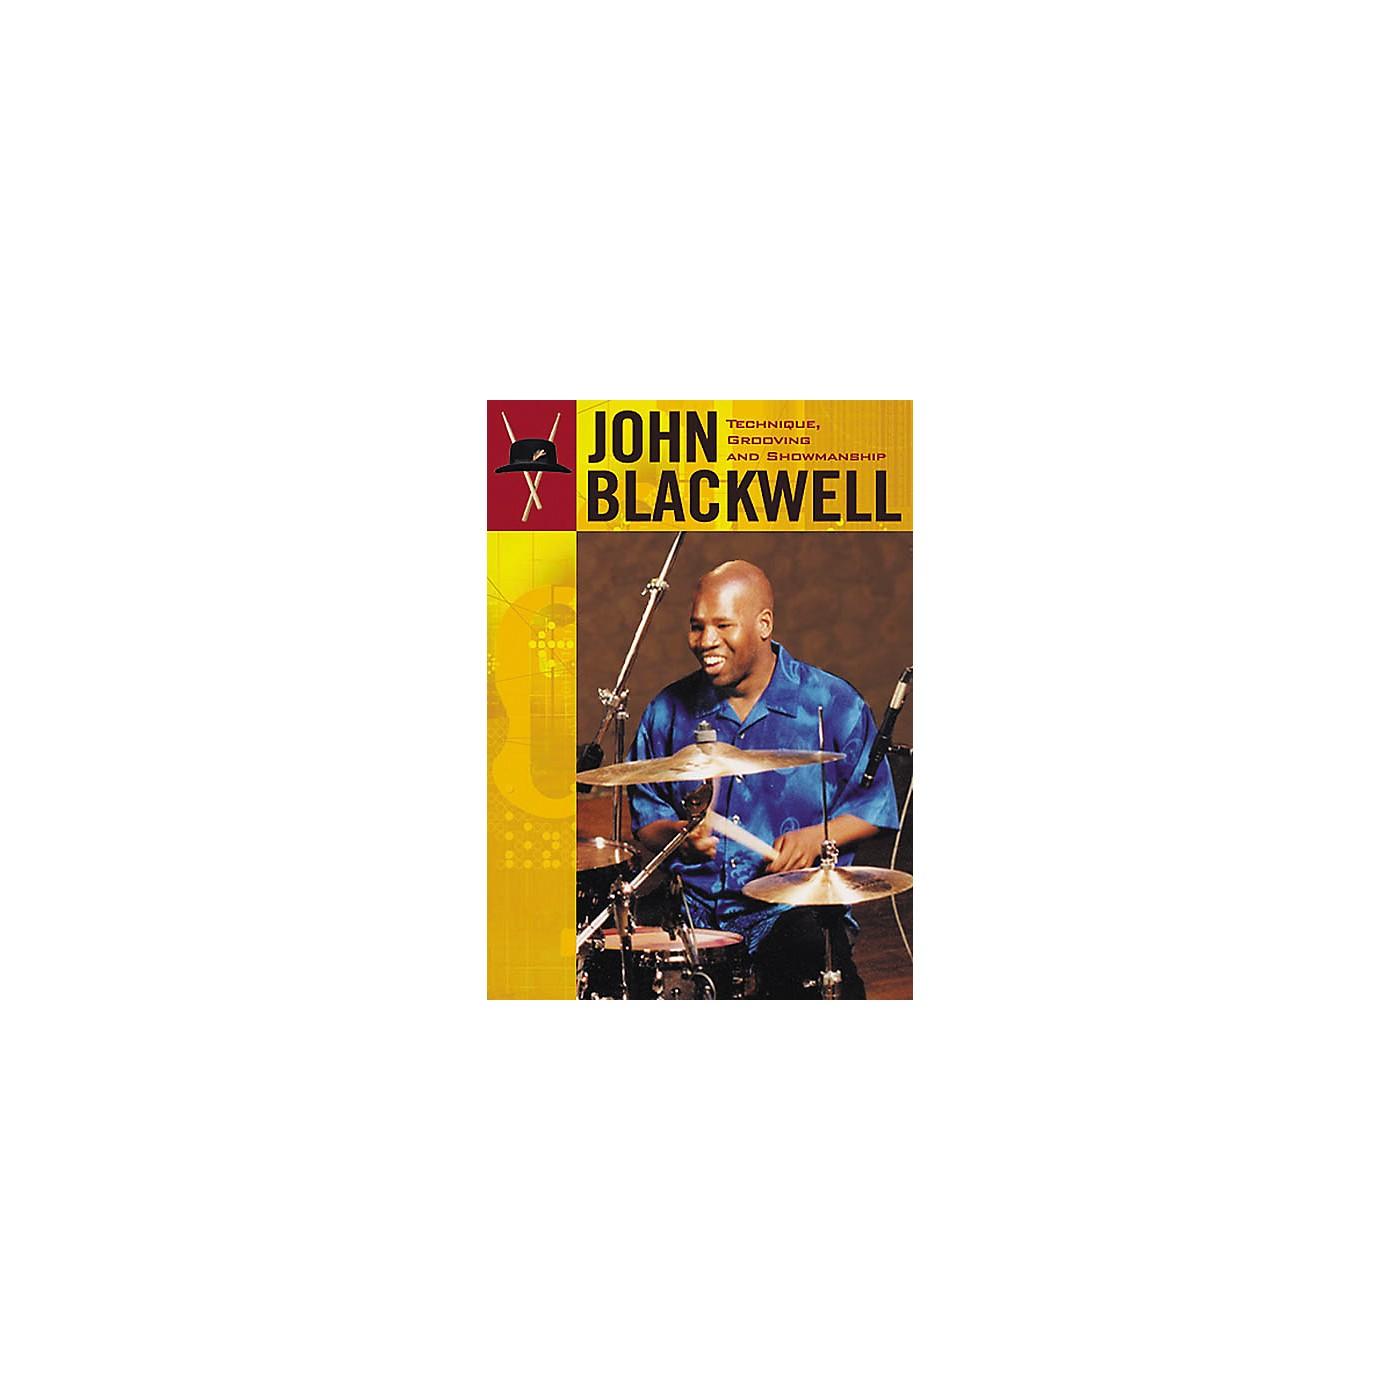 Hudson Music John Blackwell Technique, Grooving and Showmanship 2-DVD Set thumbnail